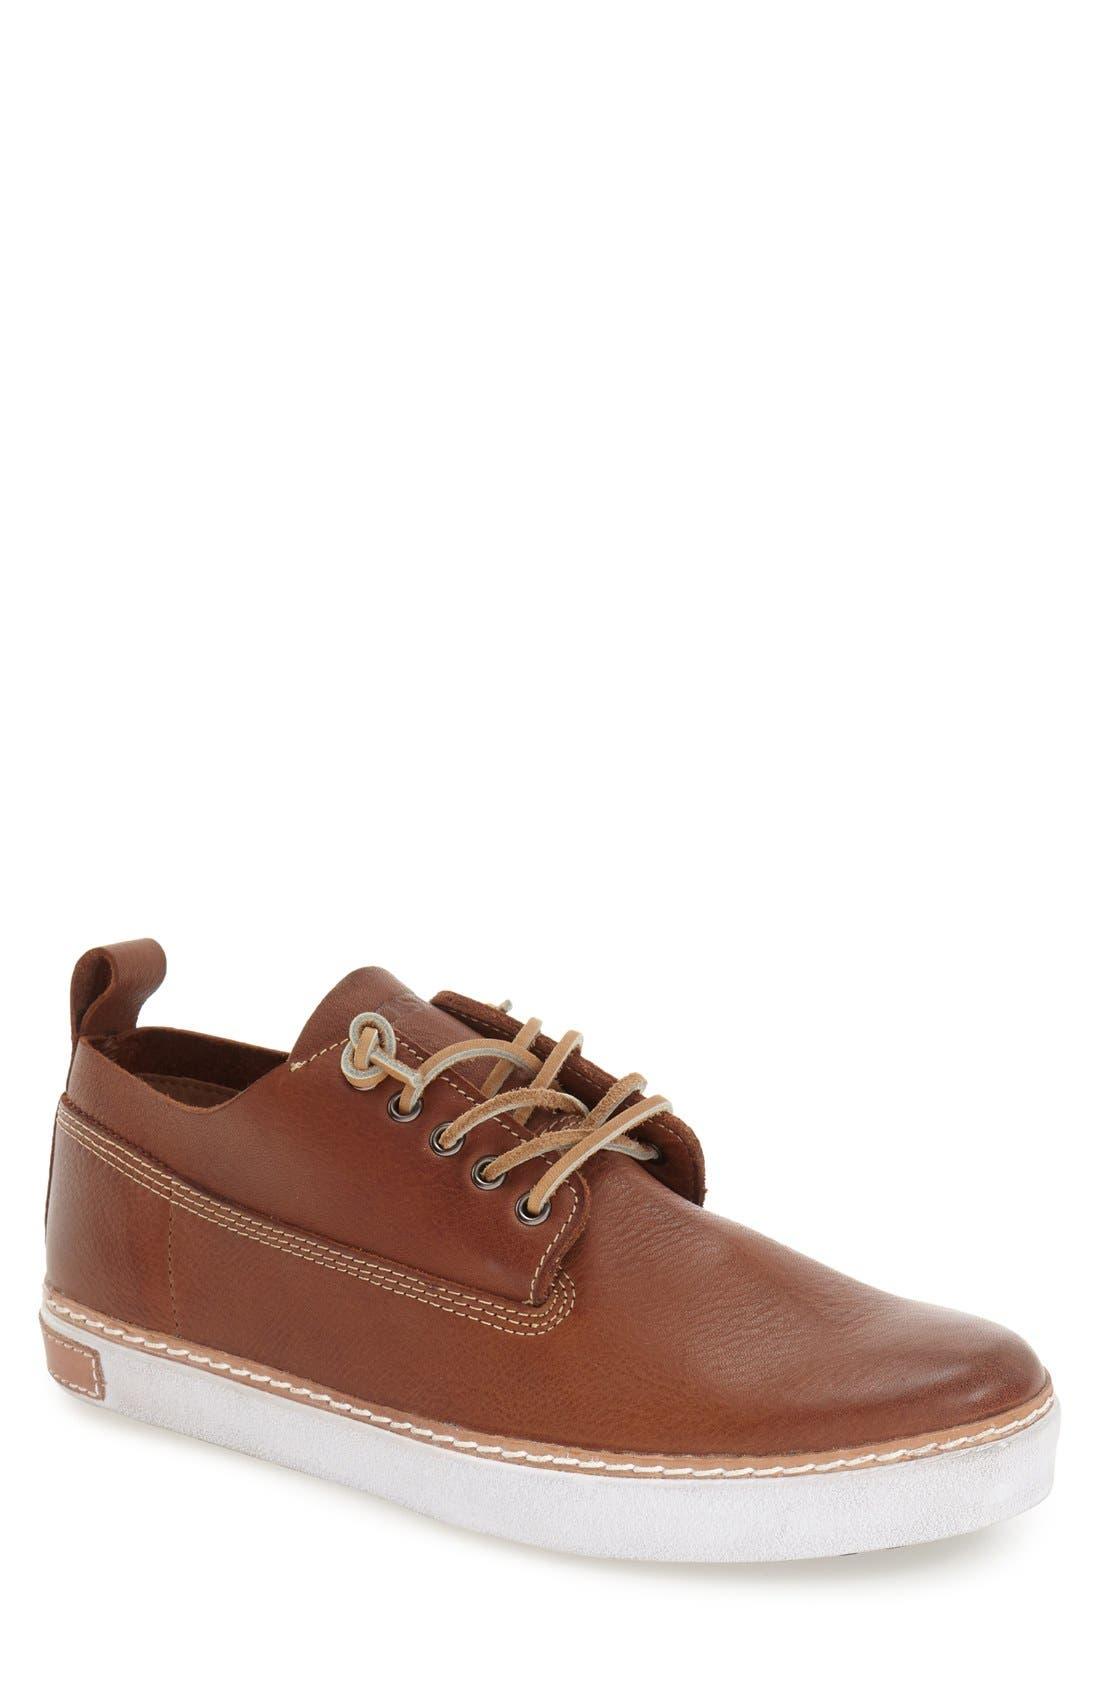 Alternate Image 1 Selected - Blackstone 'DM 10' Sneaker (Men)